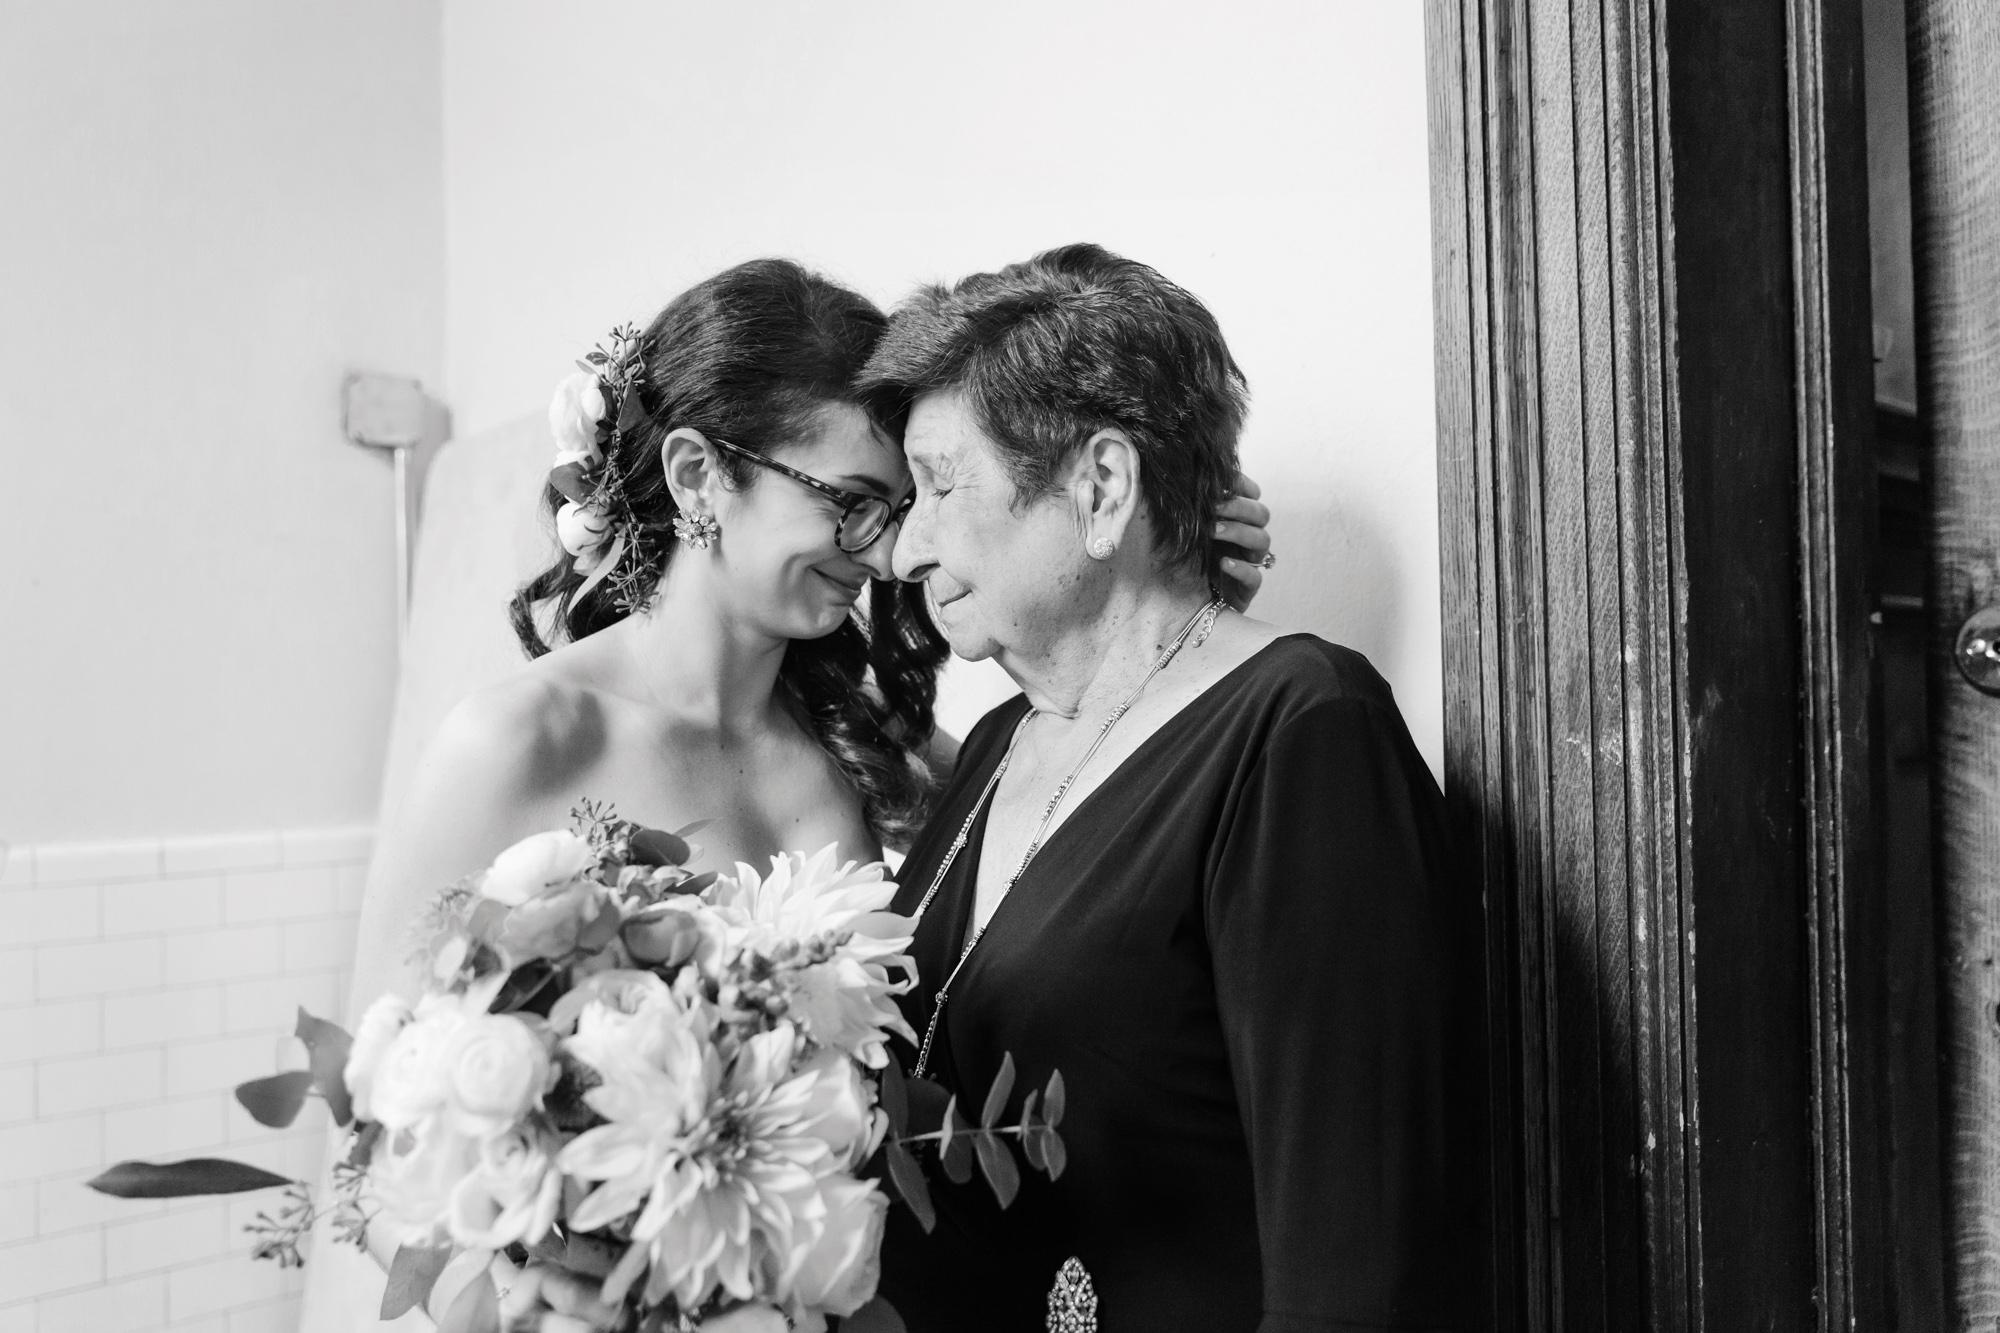 18_Kate_Sam_Picnic_House_Wedding_Brooklyn_NY_Tanya_Salazar_Photography_479.jpg